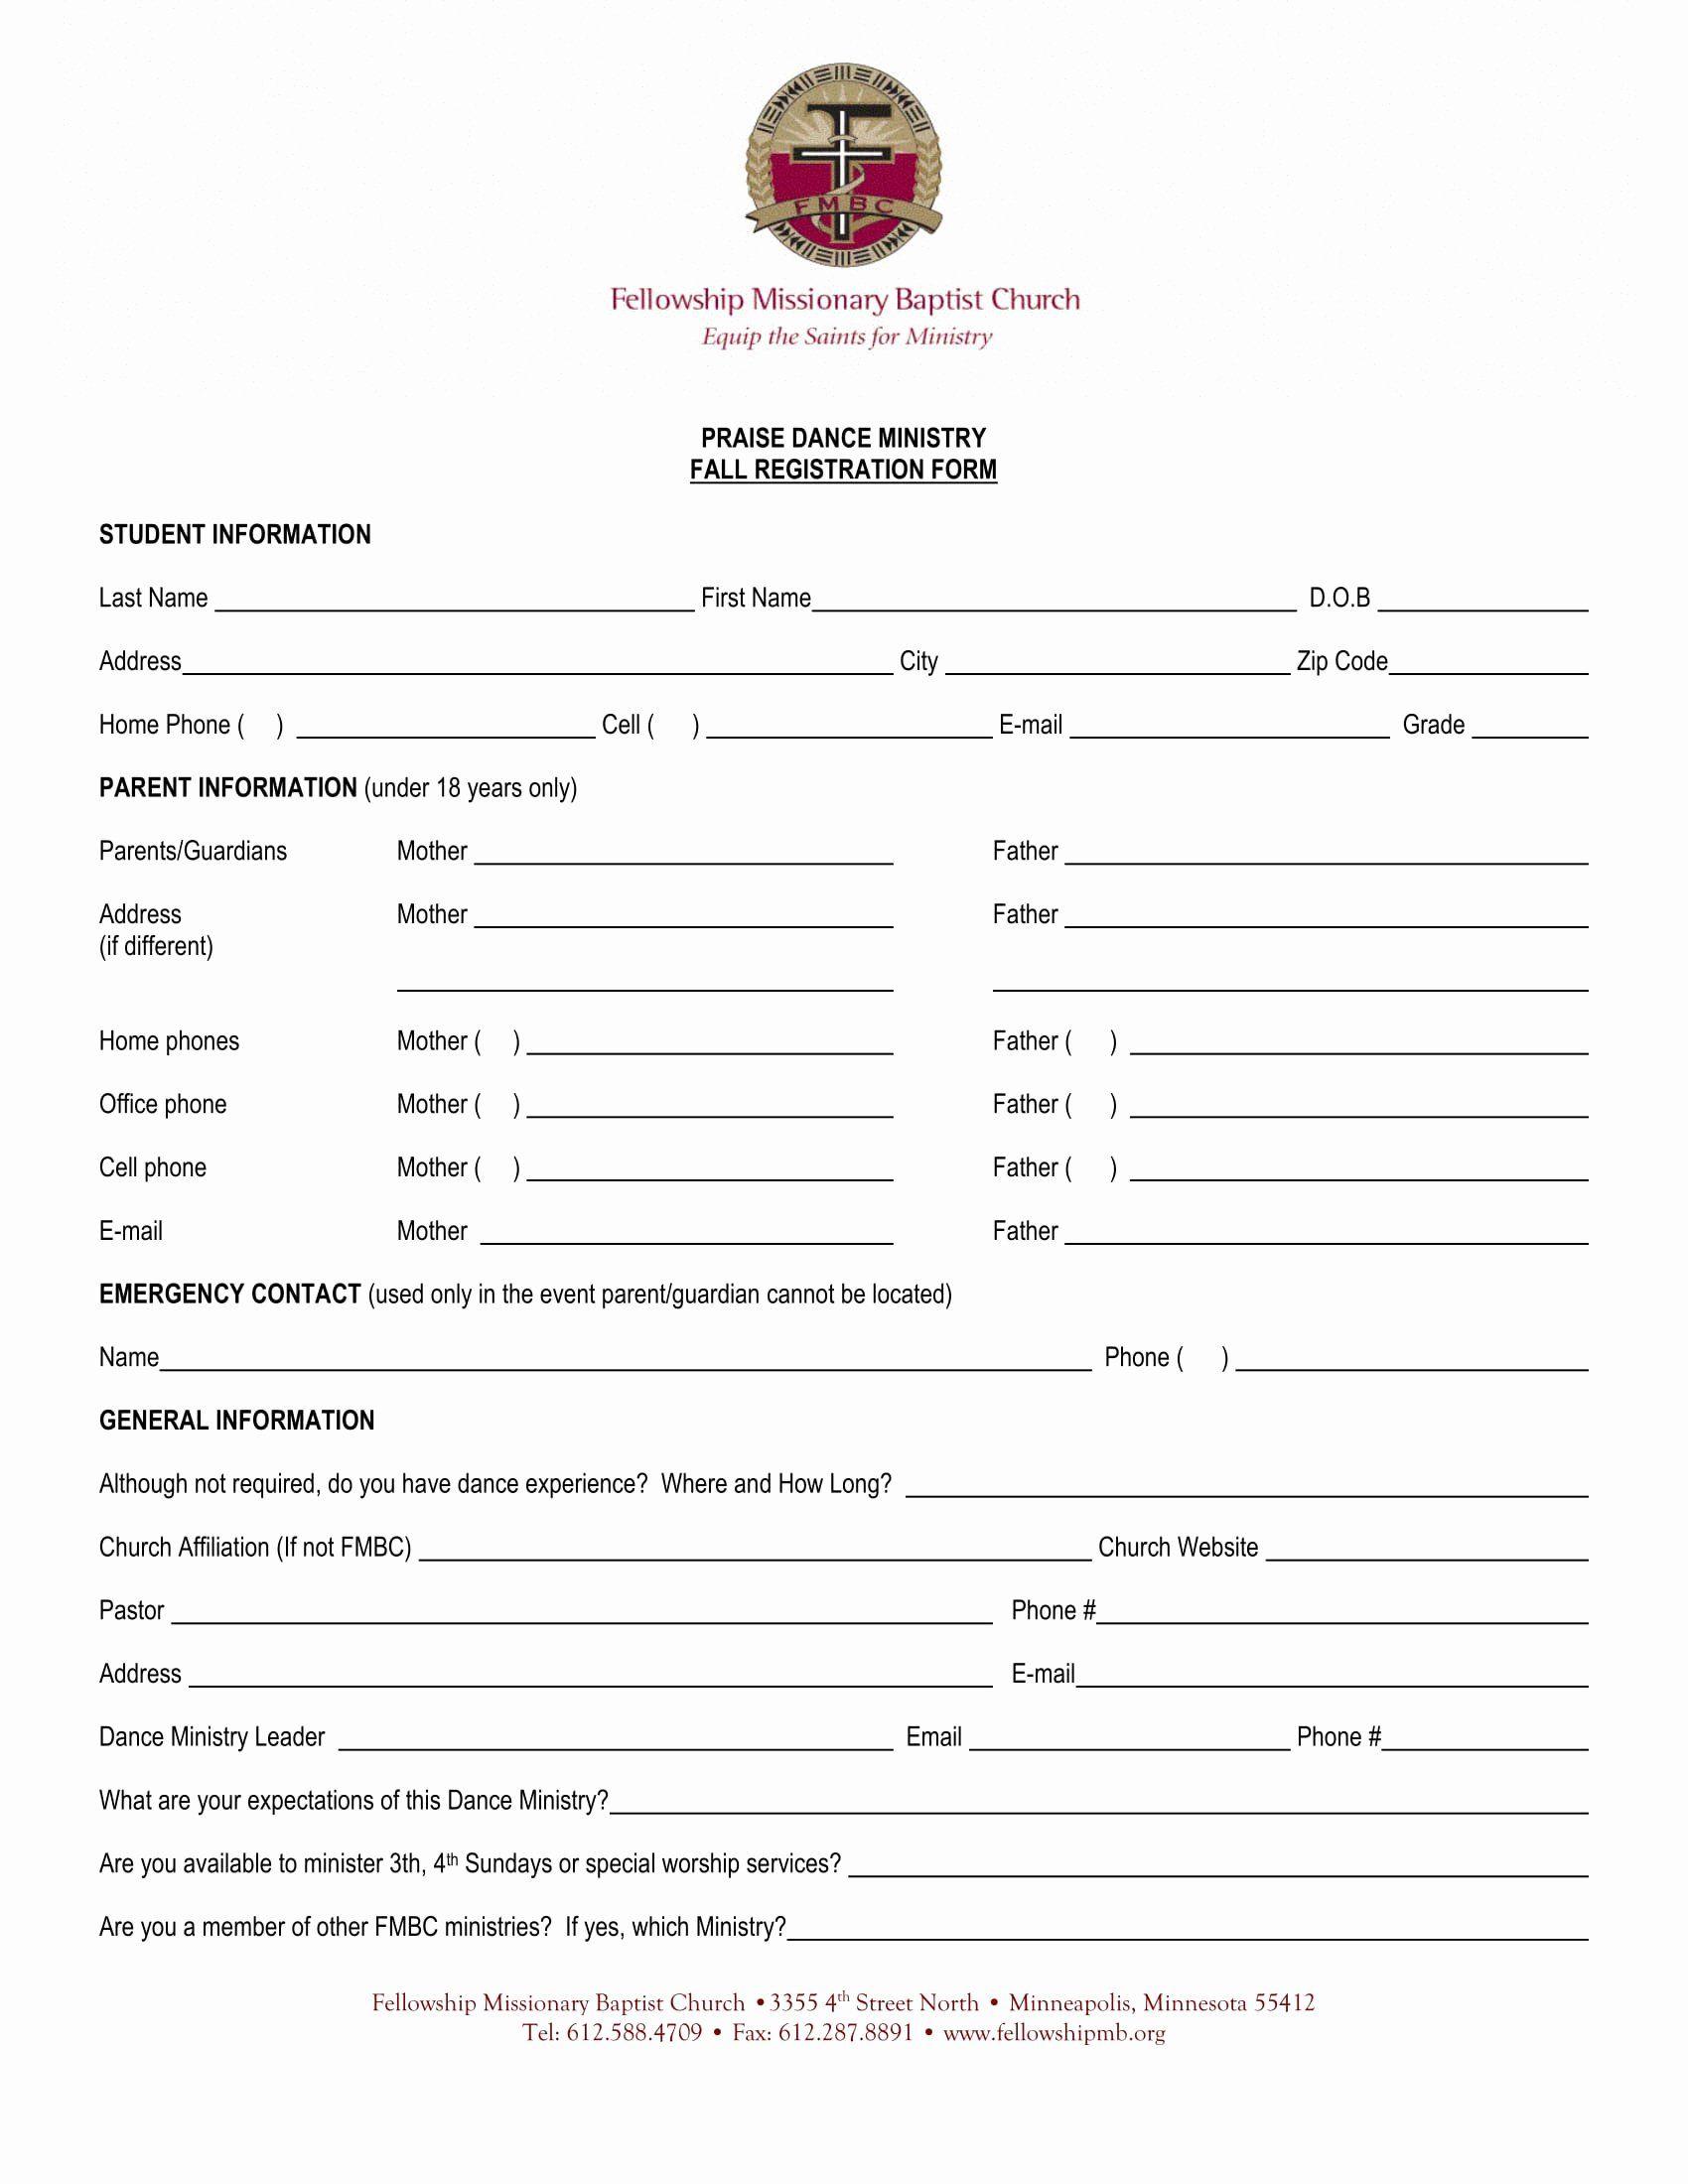 Church Registration Form Best Of 10 Dance Registration Form Samples Registration Form Sample Registration Form School Report Card